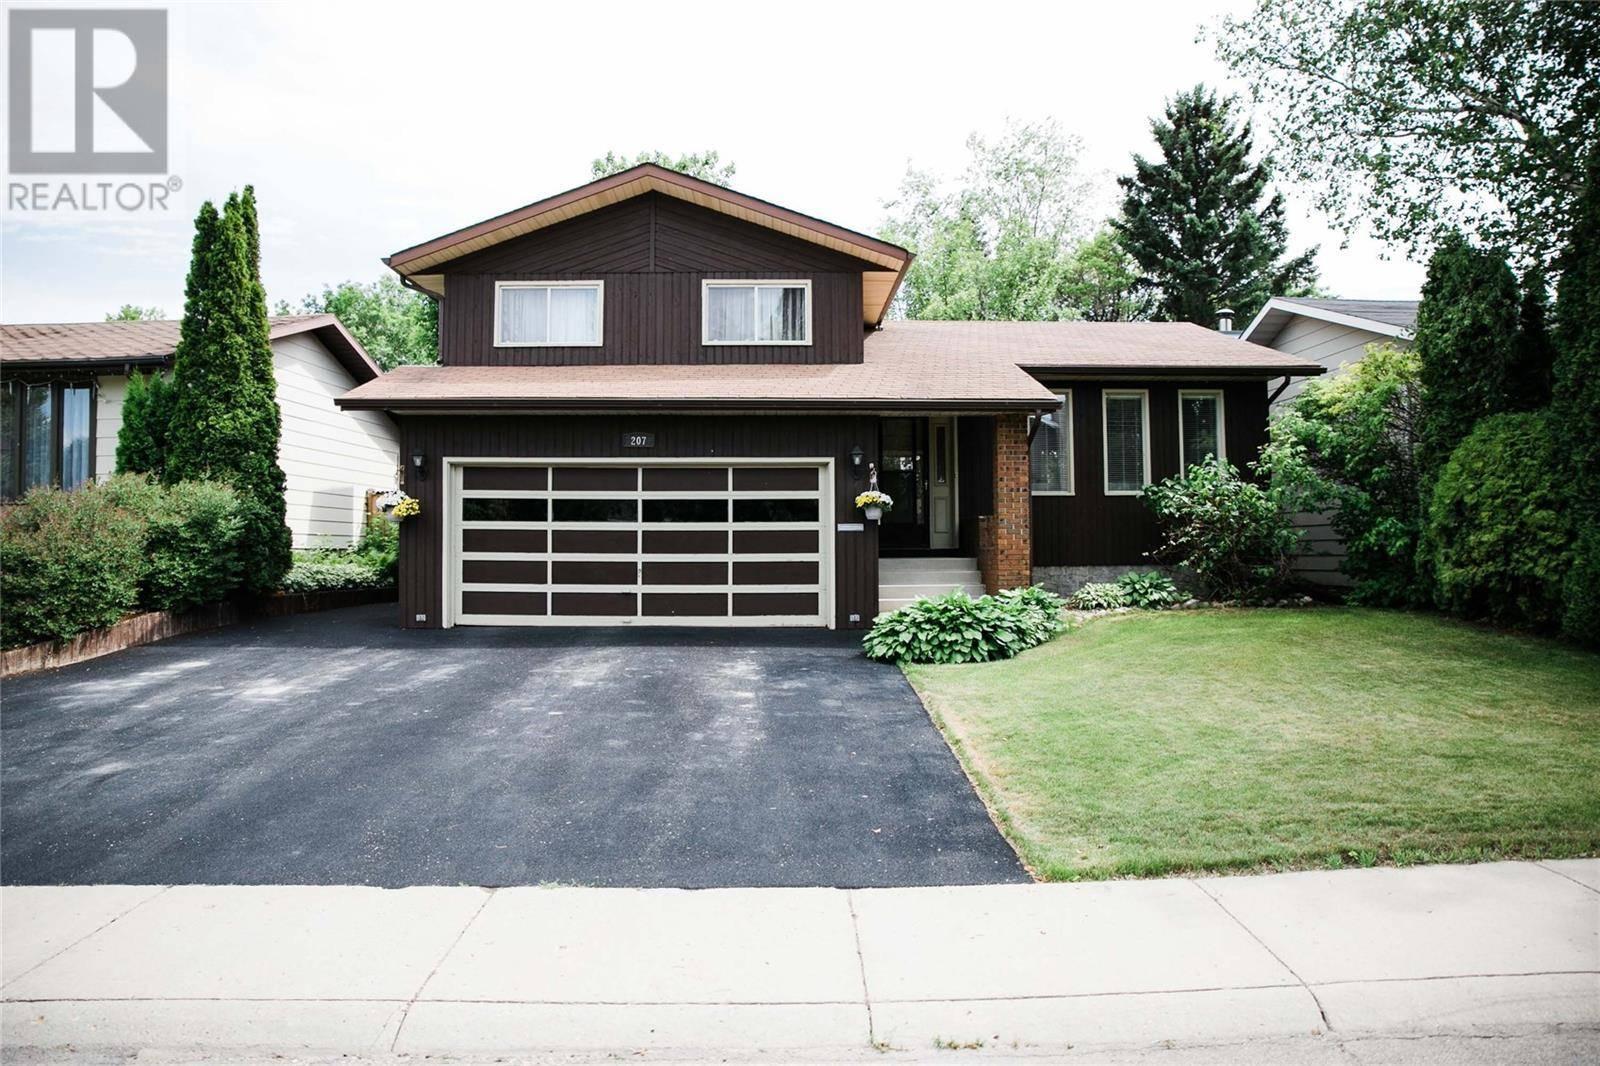 House for sale at 207 Obrien Cres Saskatoon Saskatchewan - MLS: SK780153